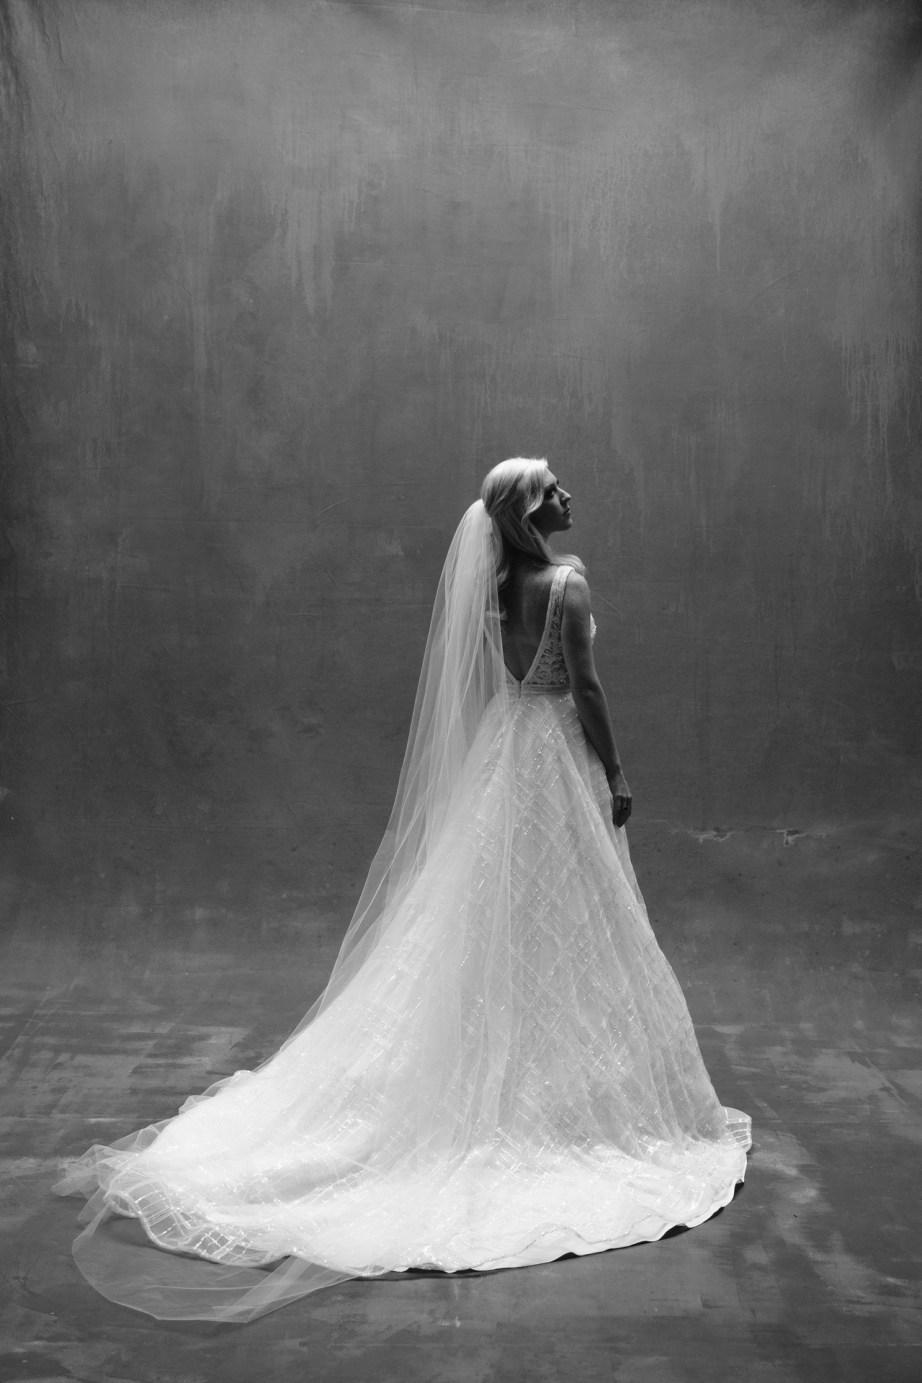 bridal_formal_studio_shoot_nicole_caldwell02